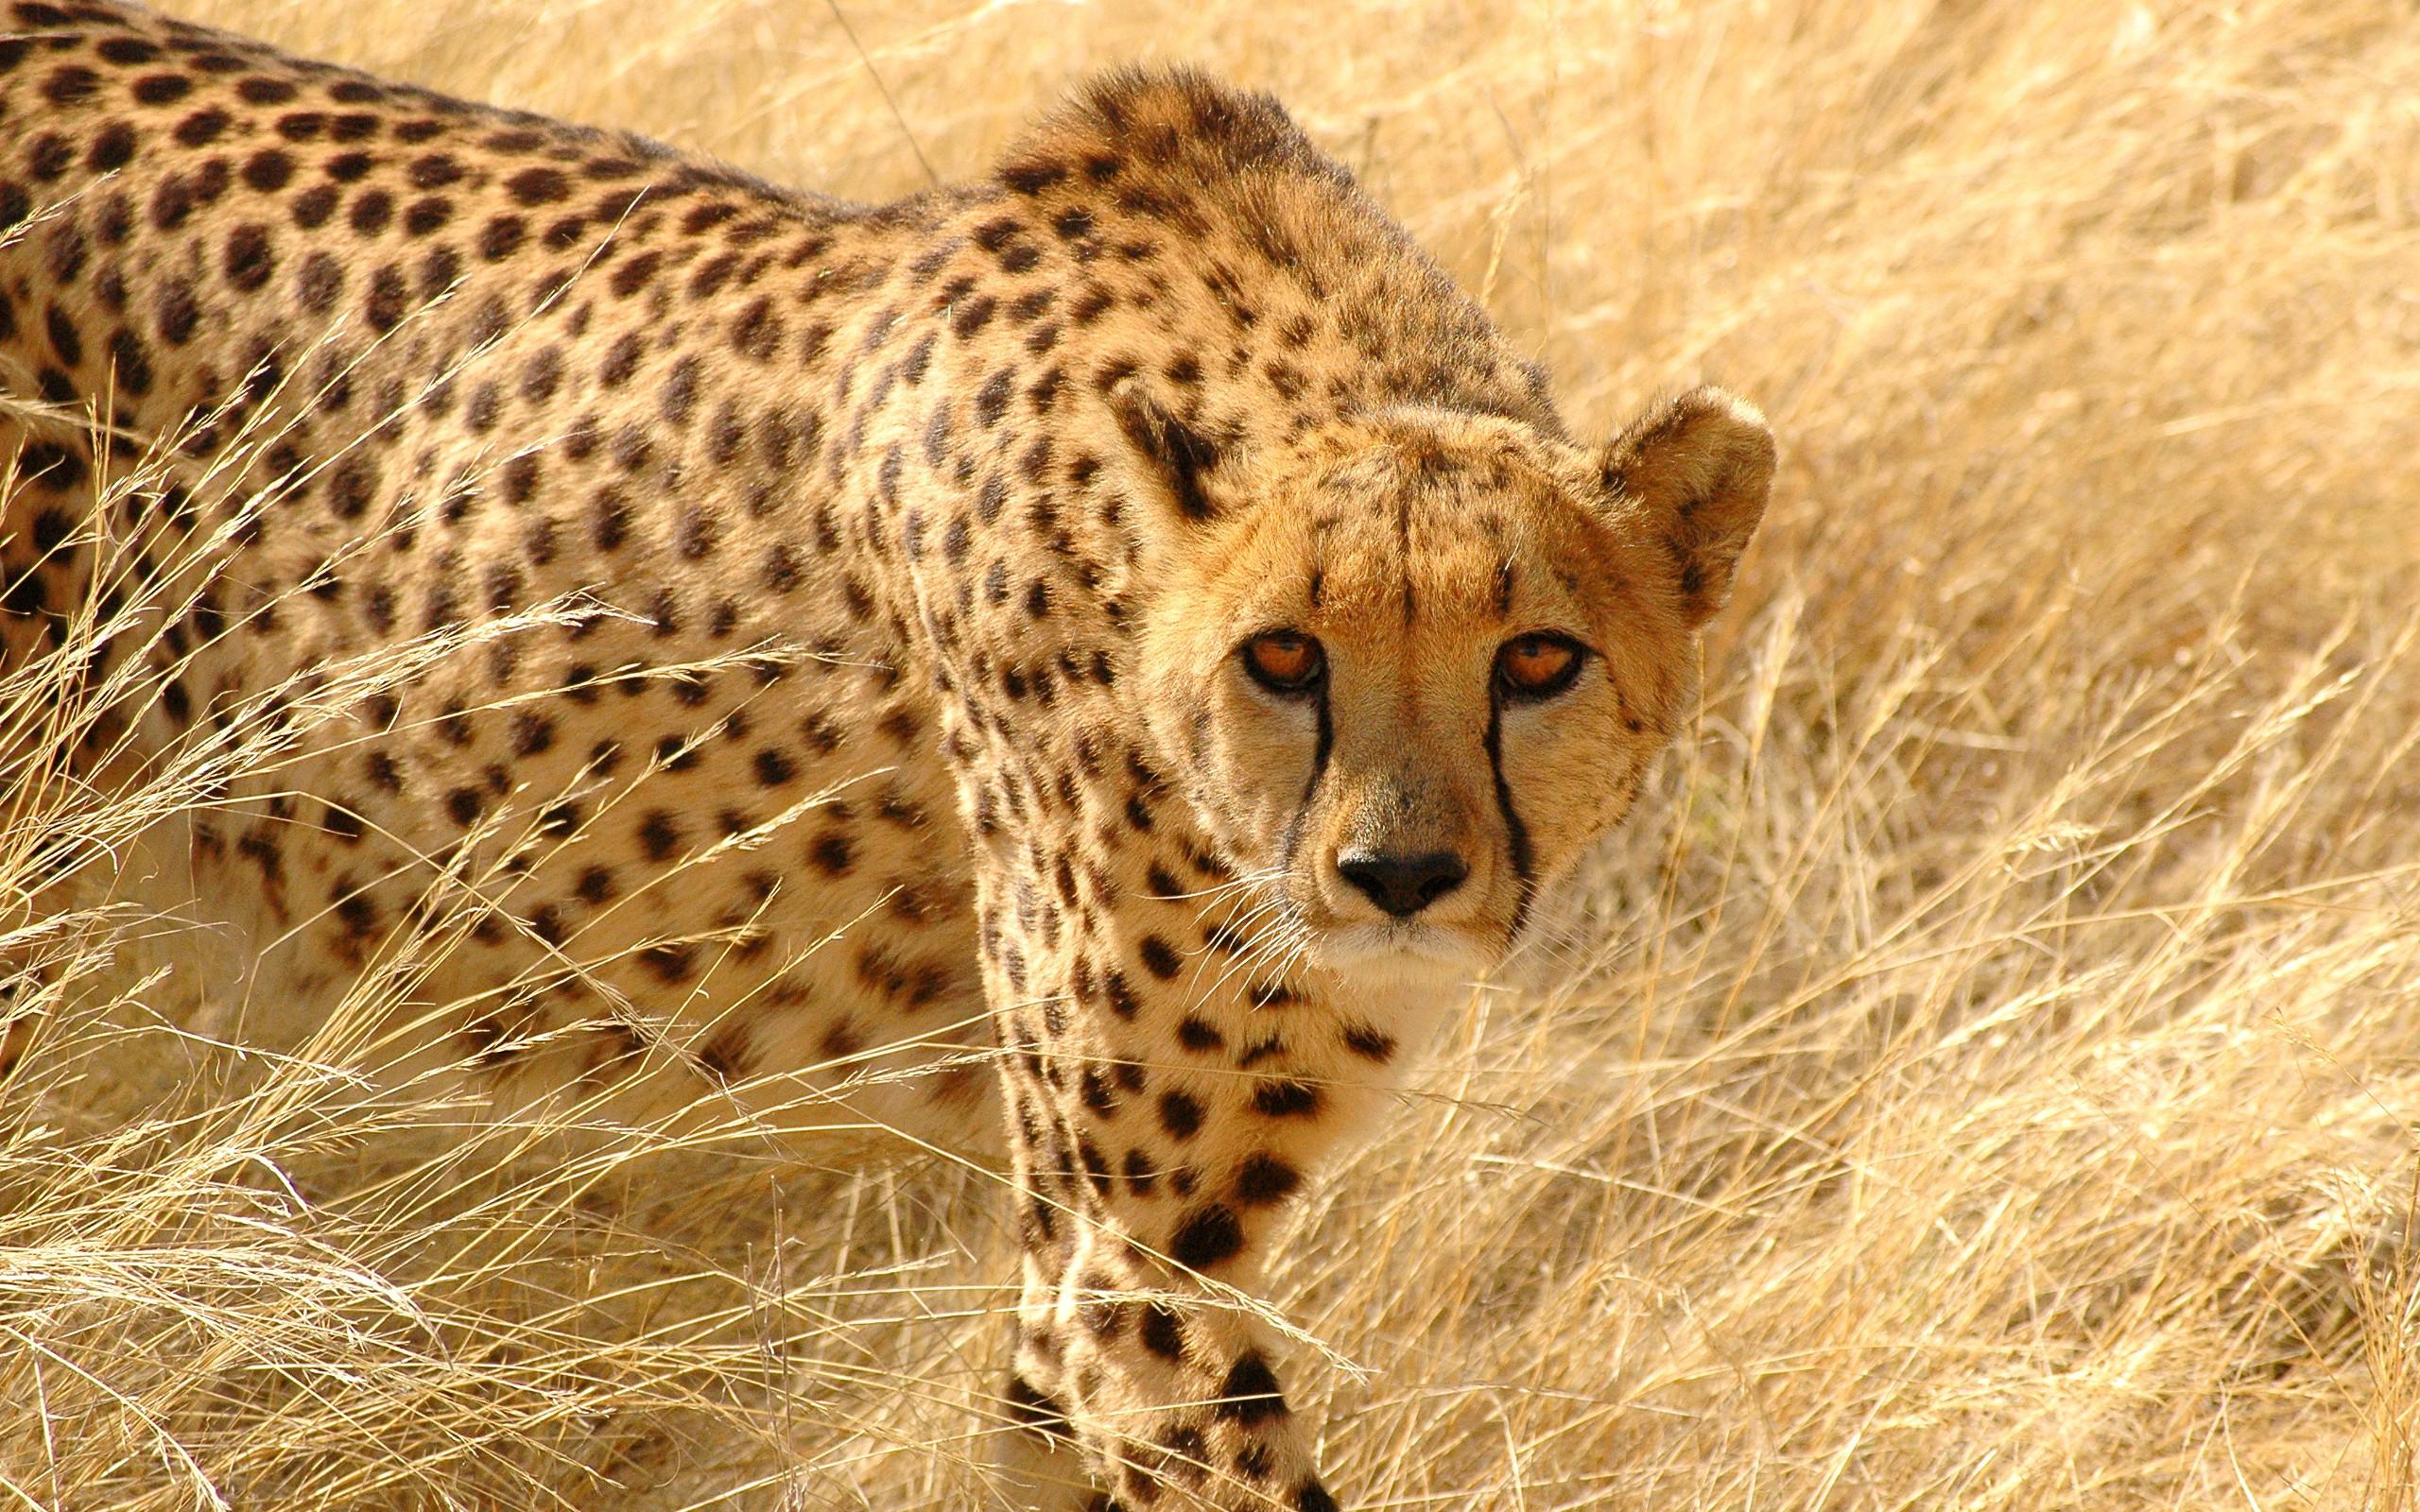 Cheetah HD Wallpaper | Background Image | 2560x1600 | ID:287226 - Wallpaper Abyss